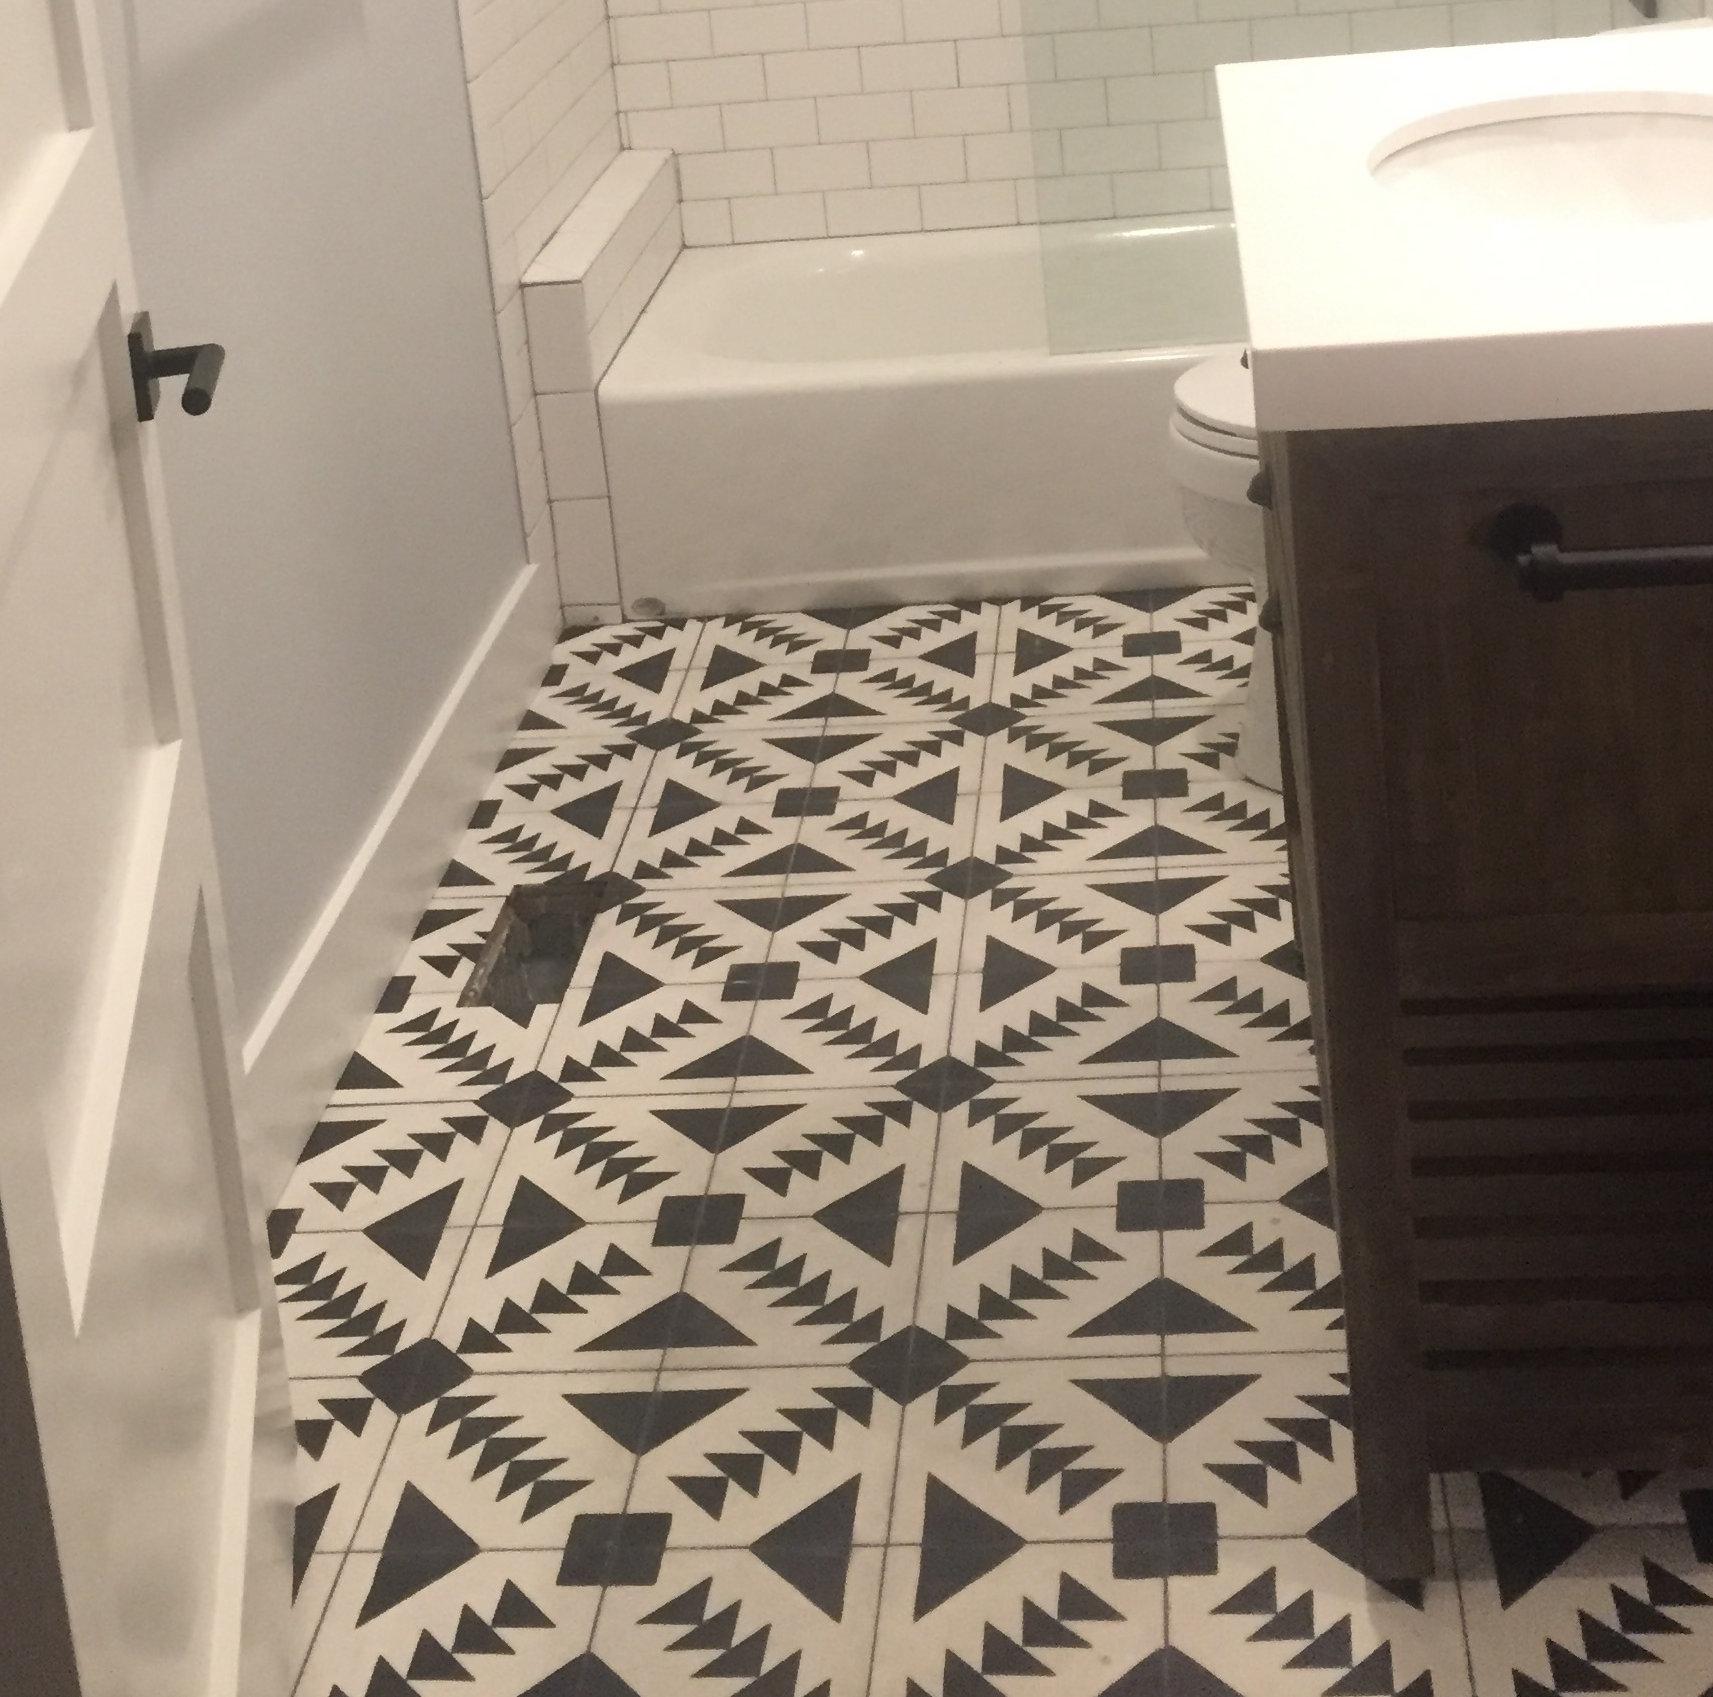 Moroccan Mosaic Tile House Tadla 8 X Handmade Cement In Black White Reviews Wayfair